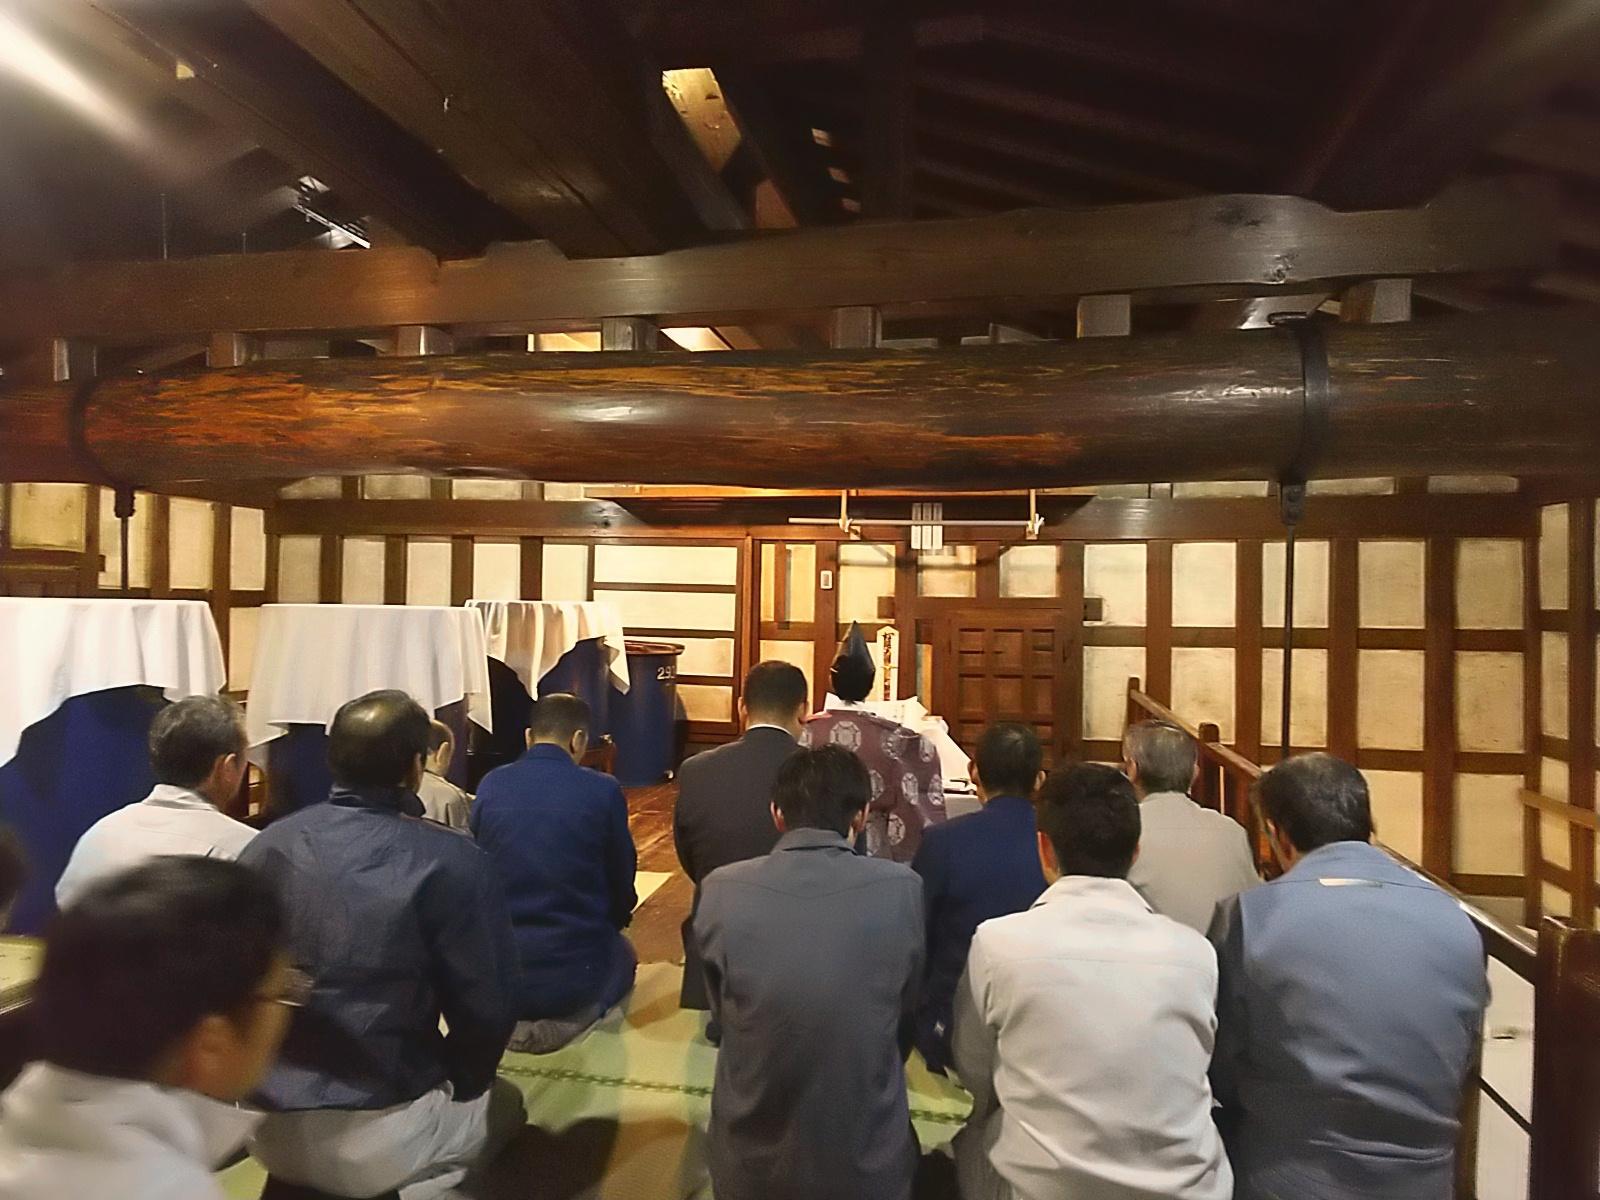 http://www.fukukomachi.com/blog/photo/C360_2018-11-27-13-58-01-388.jpg